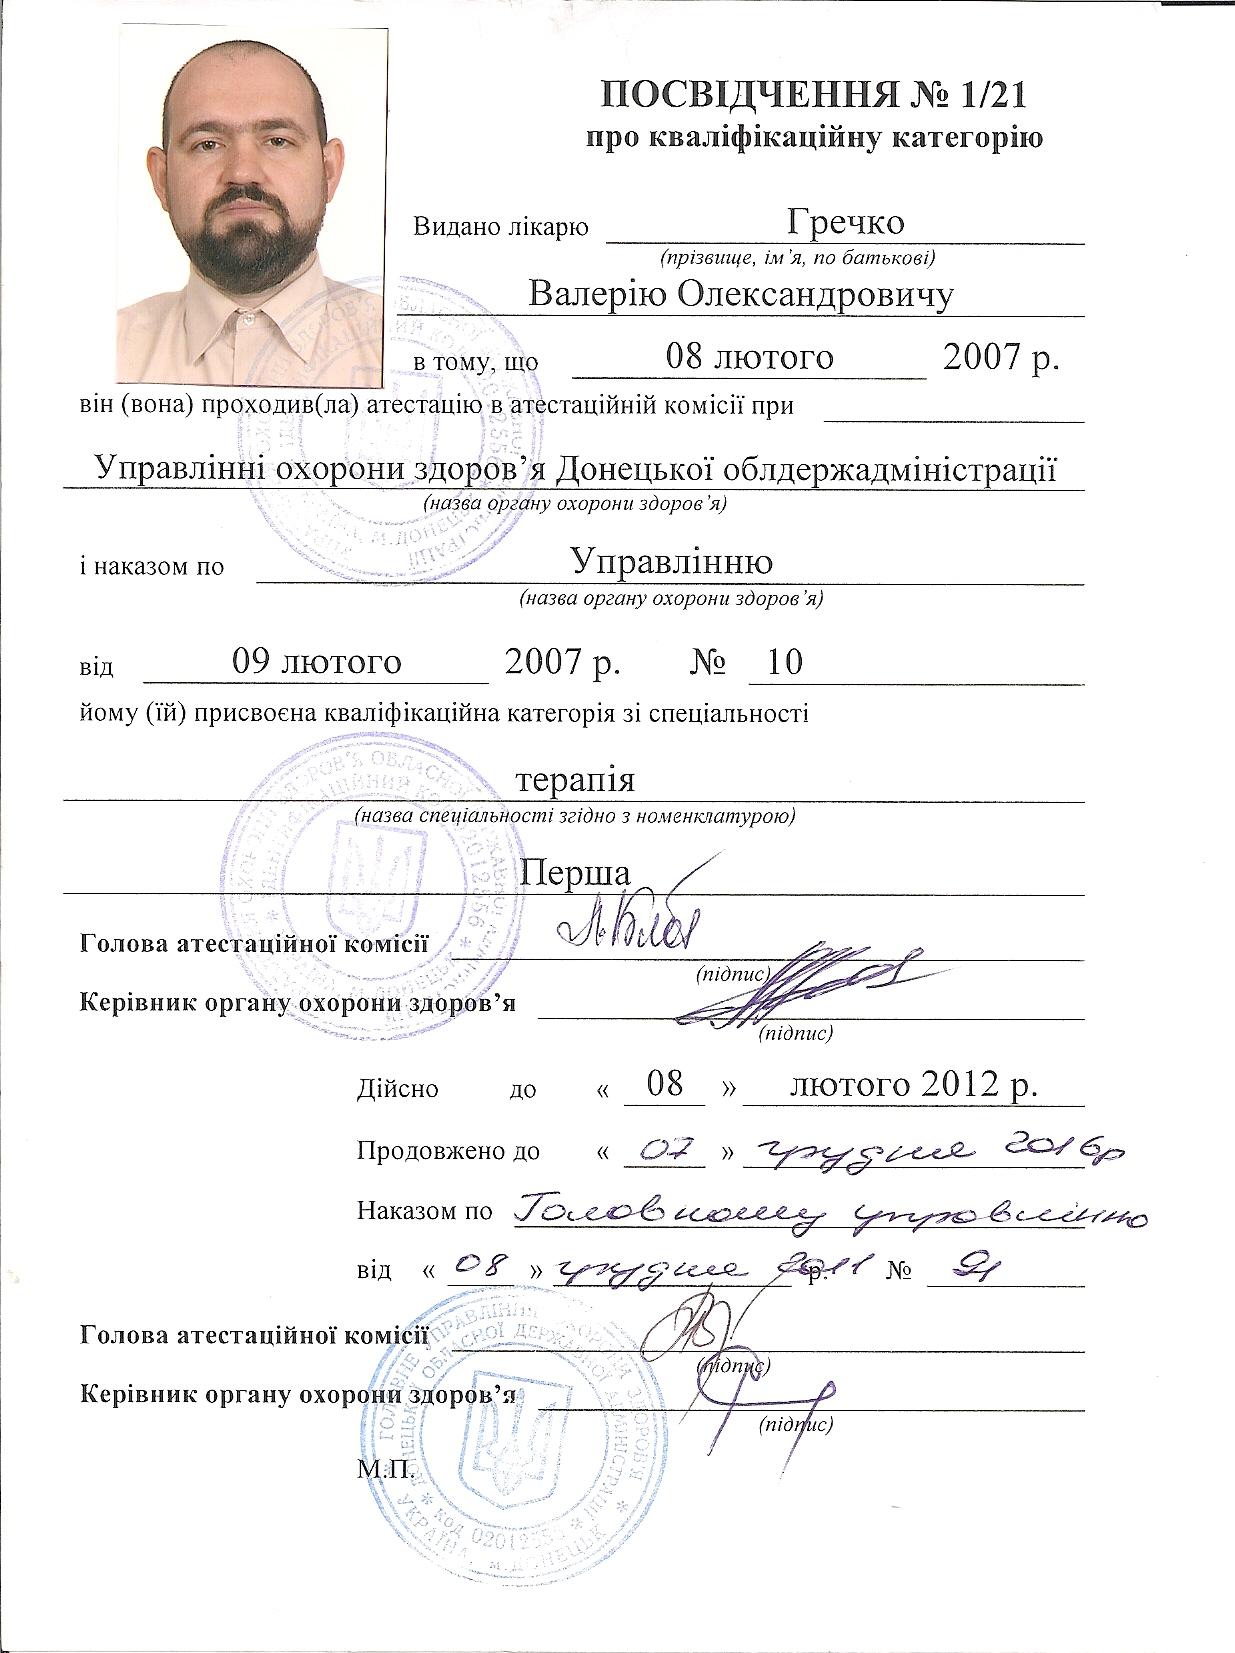 Гречко В. А. - категория доктора